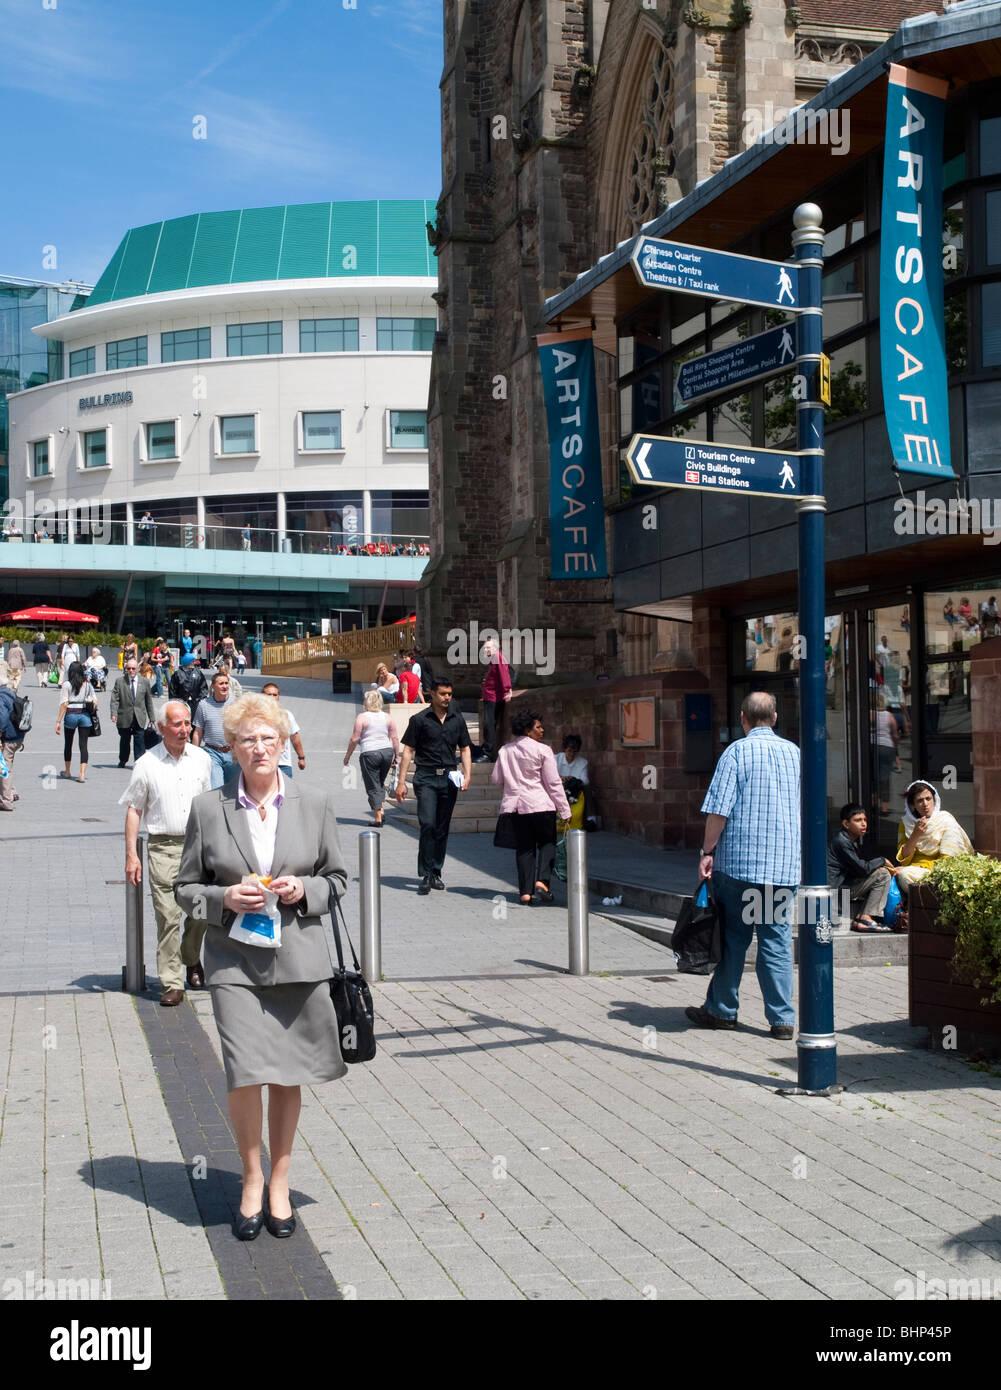 Birmingham City Centre, West Midlands UK - Stock Image